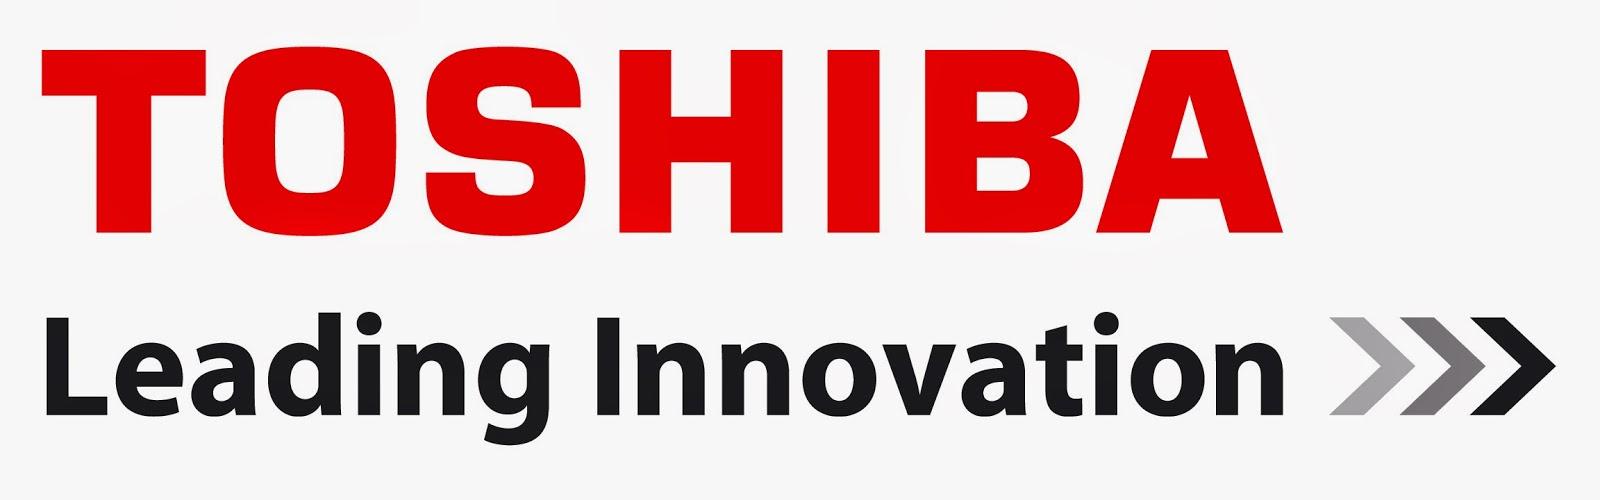 Daftar Harga Laptop Toshiba Terbaru